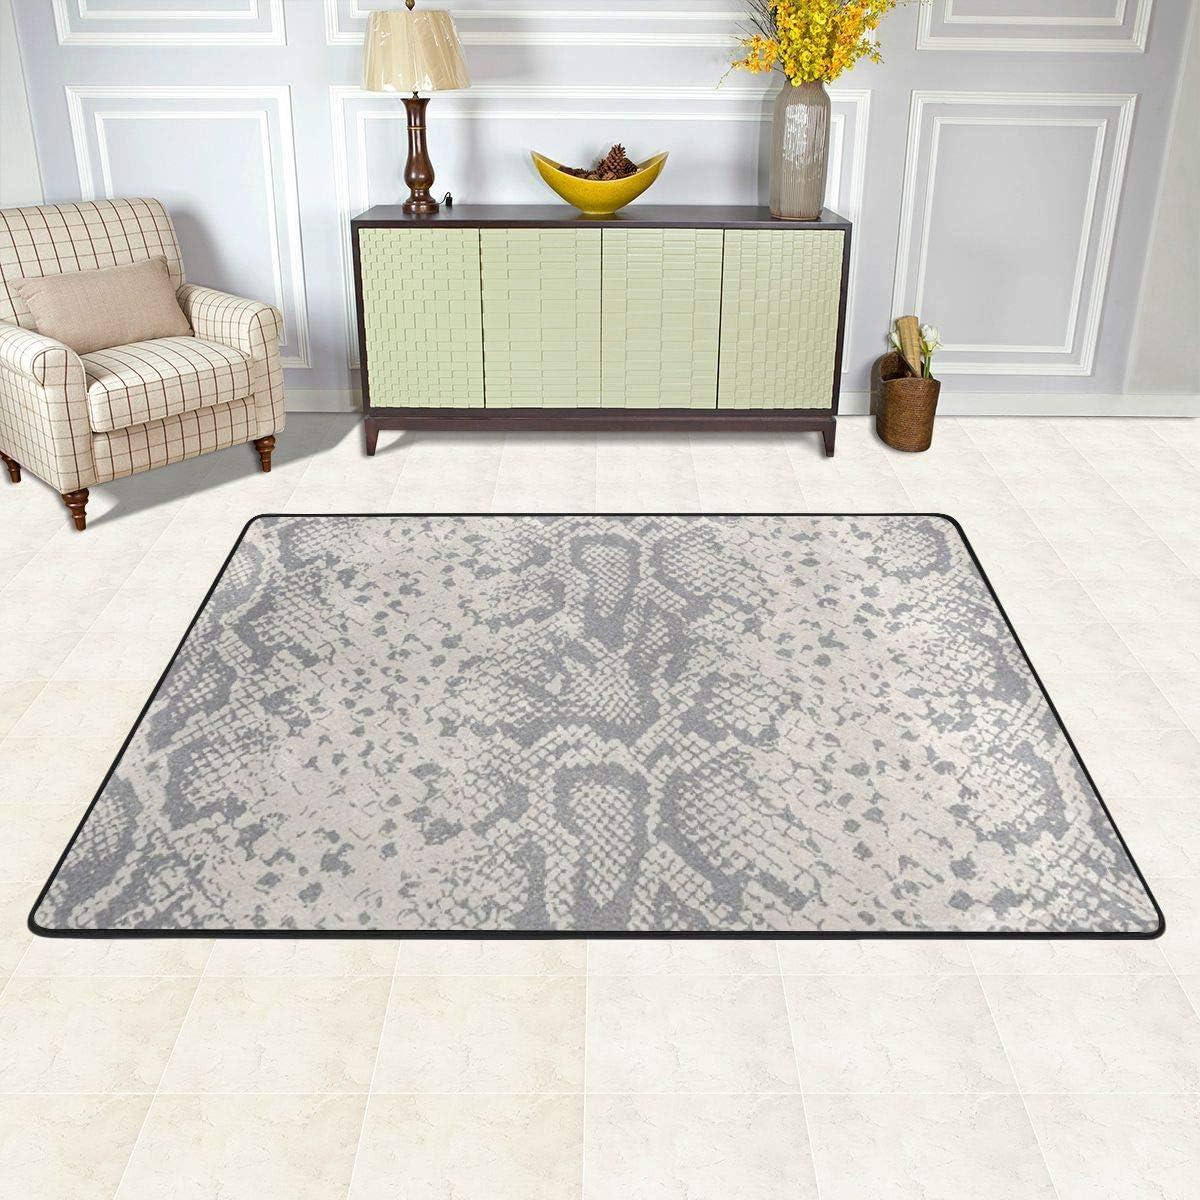 Classic お値打ち価格で Carpet for Office Bathtub M Animal Snakeskin 最新アイテム Decoration